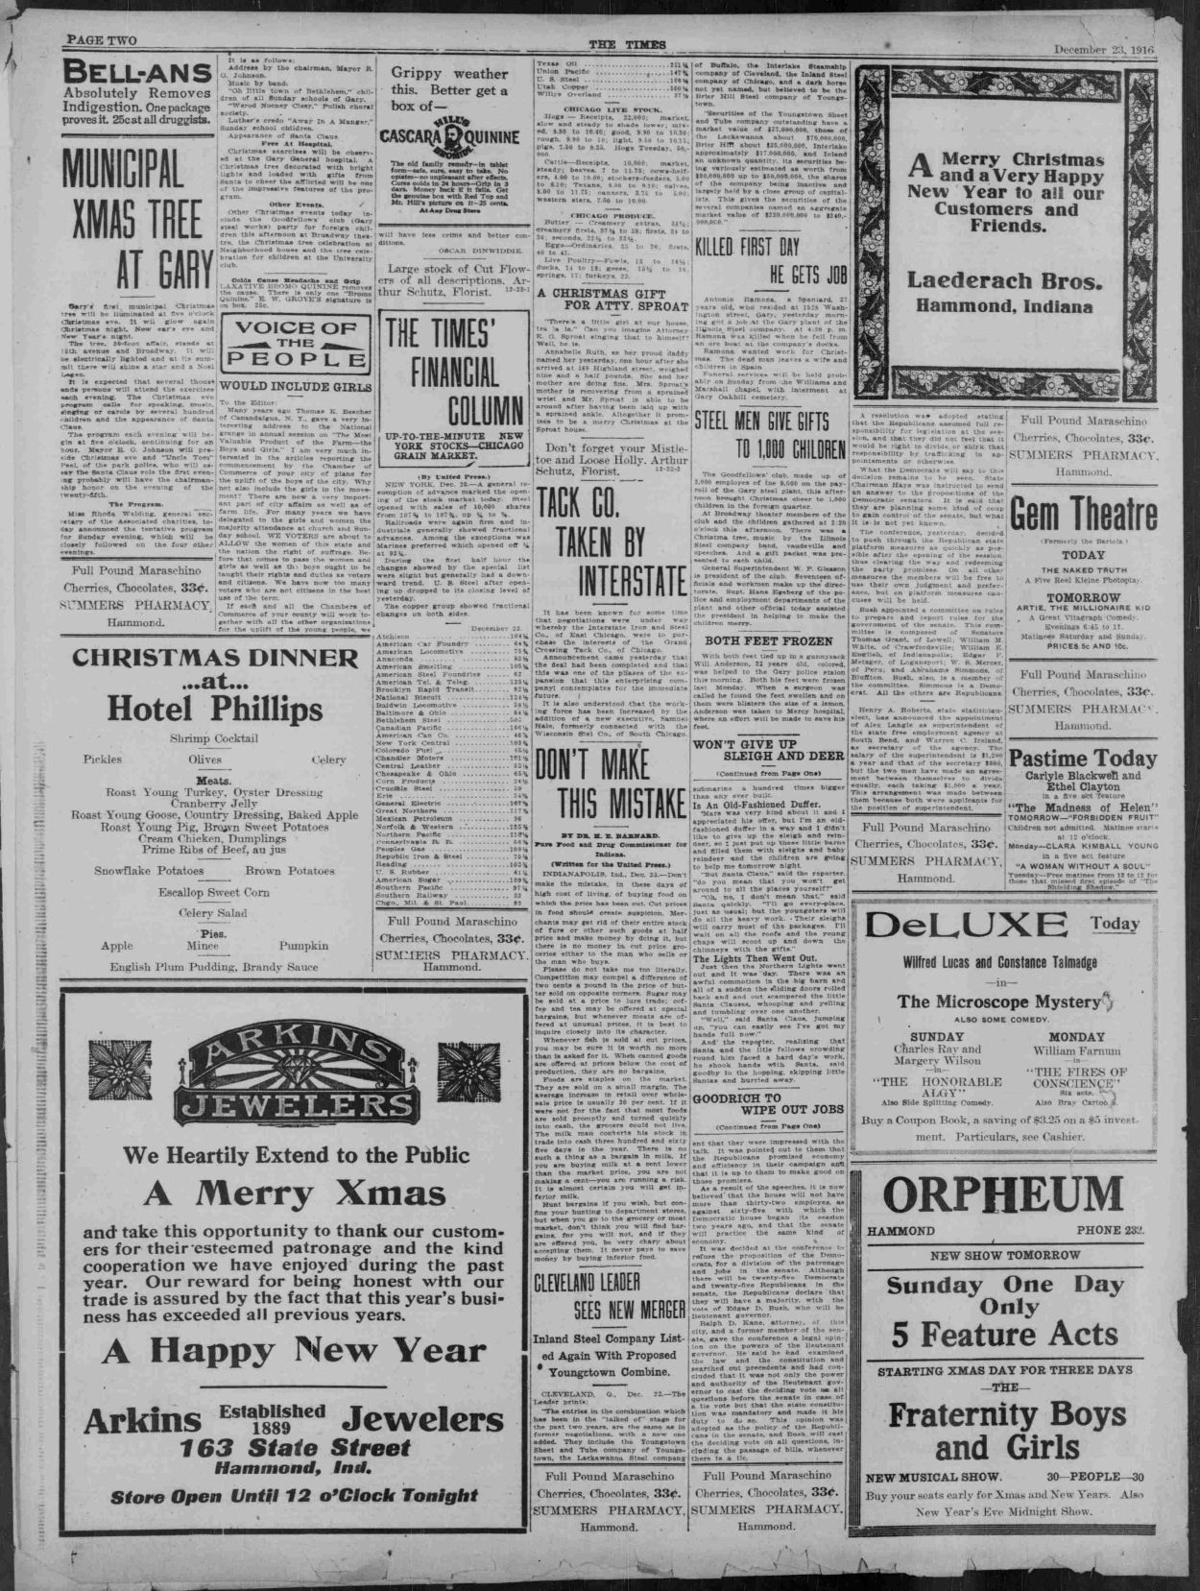 Dec. 23, 1916